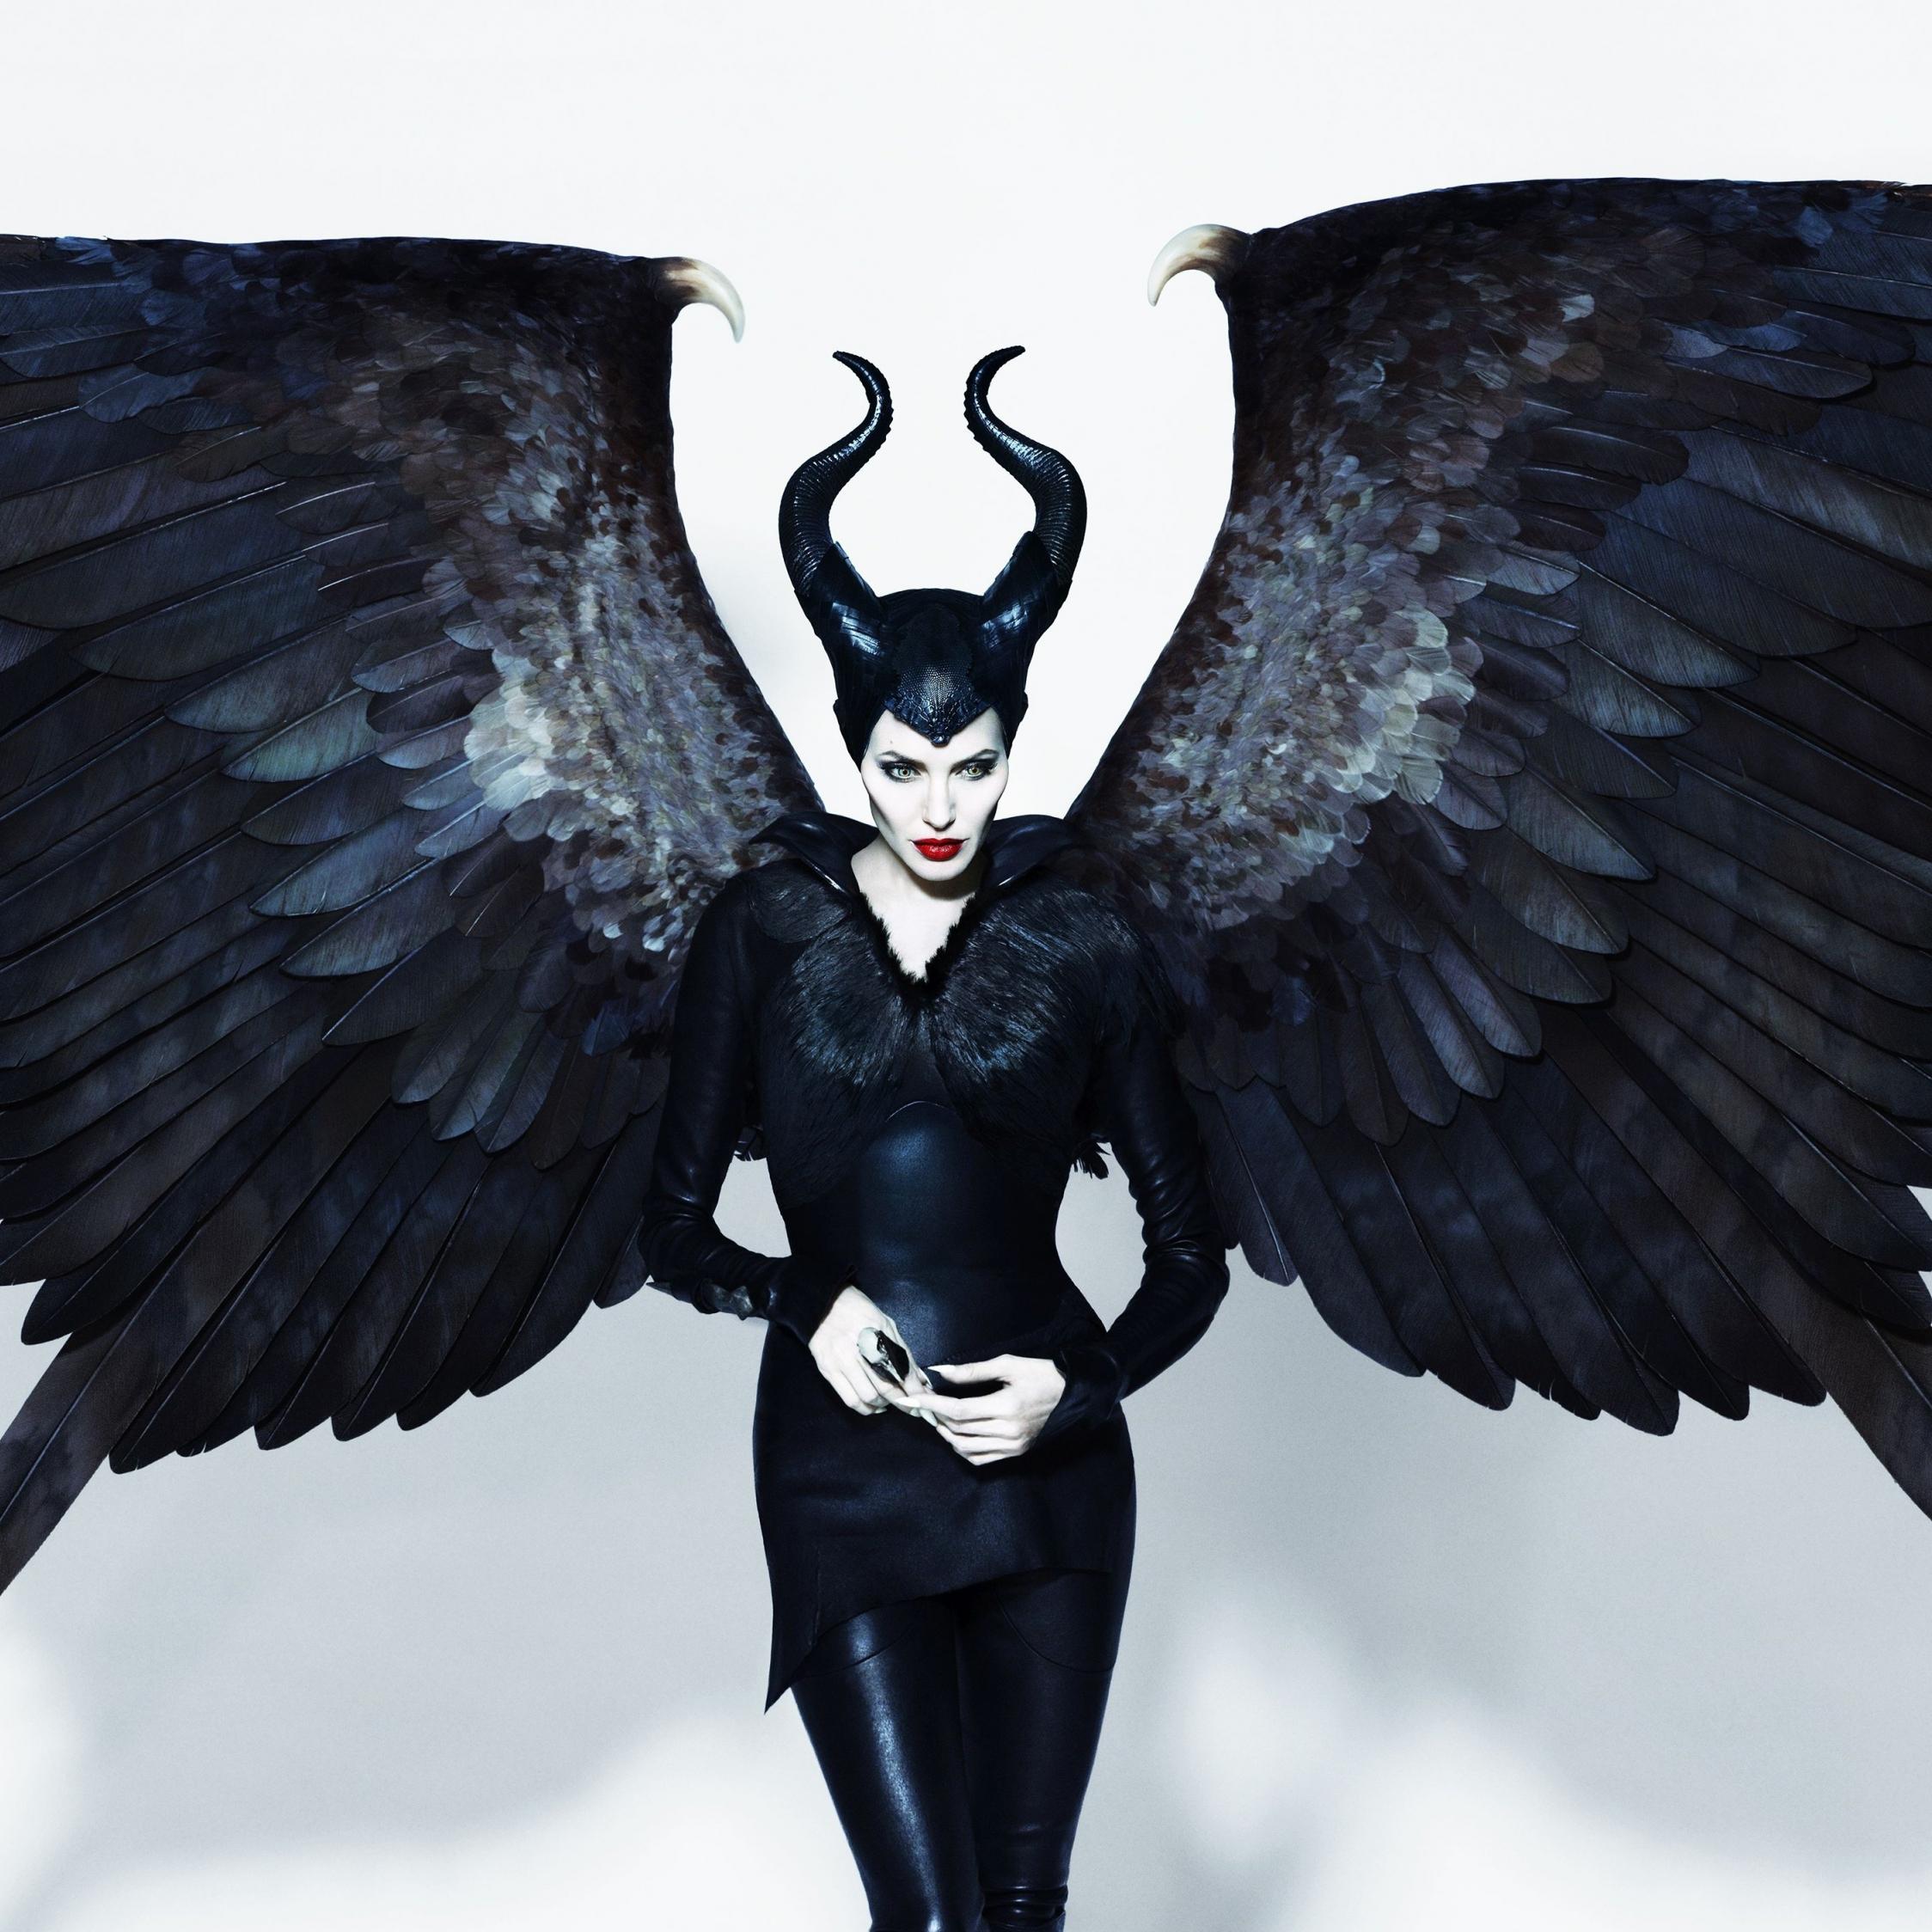 Download 2248x2248 Wallpaper Maleficent Angelina Jolie